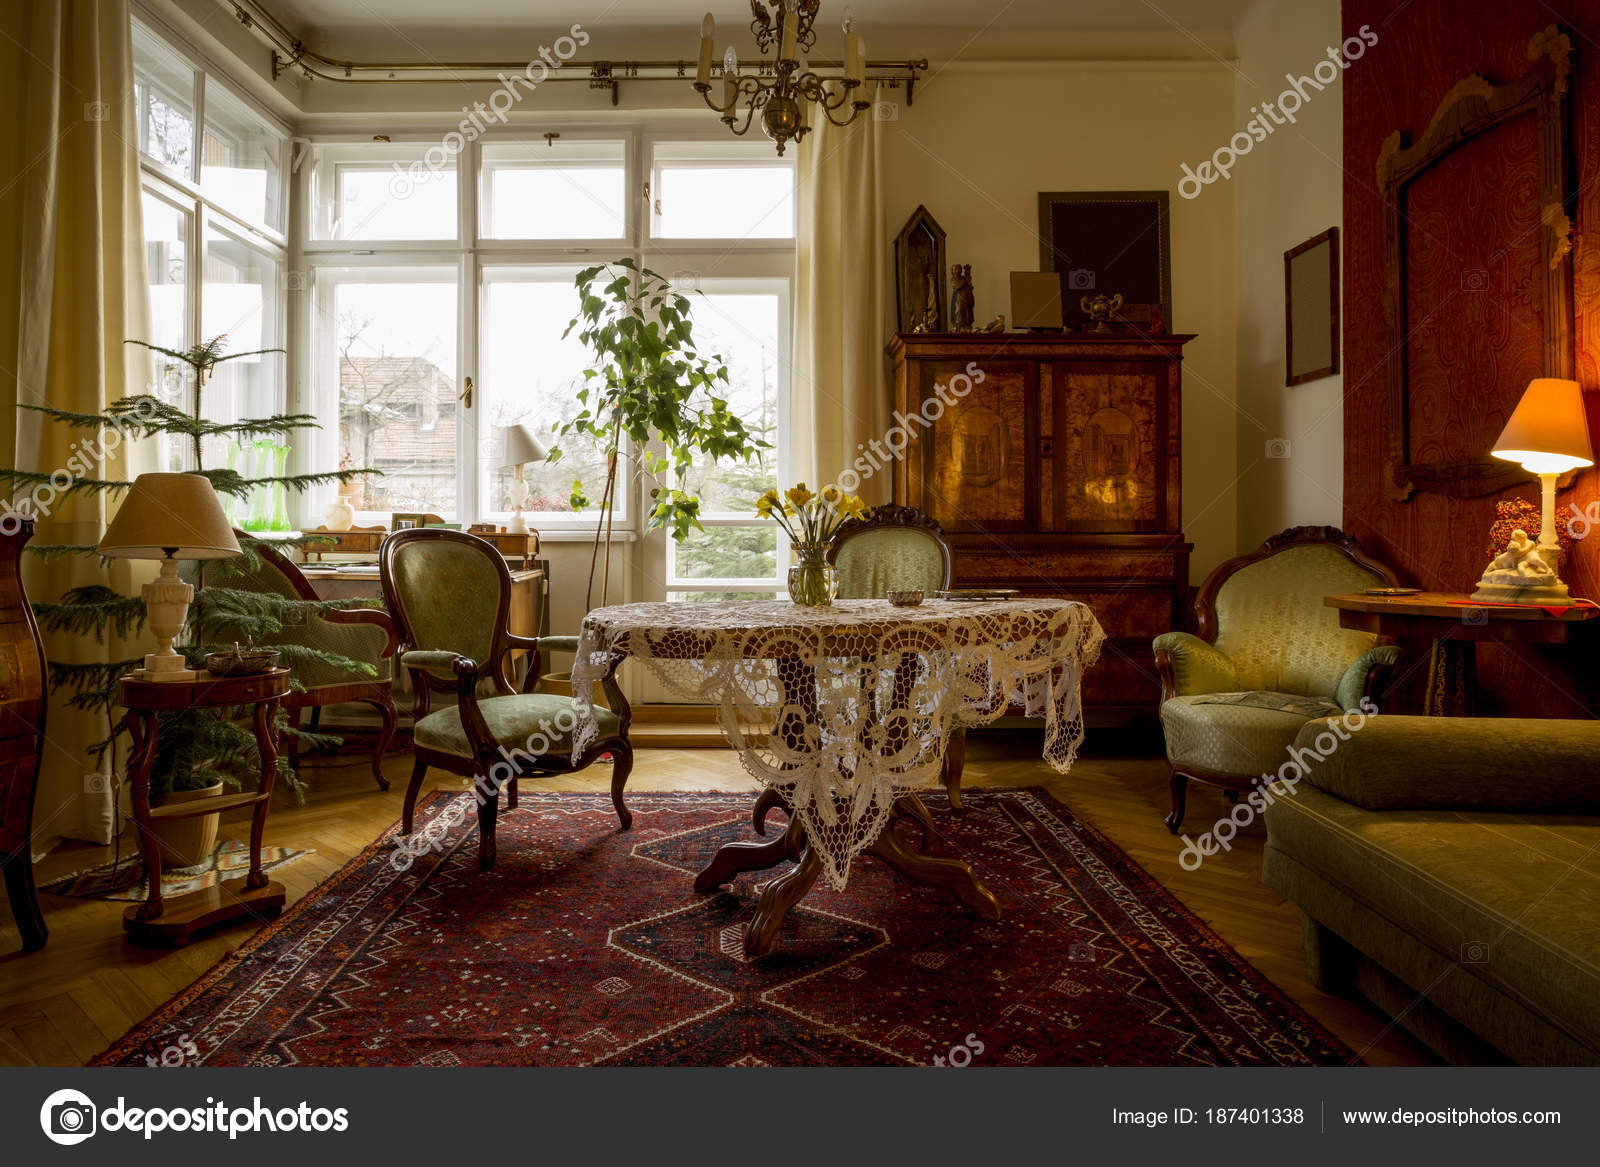 Ouderwetse woonkamer met antieke meubelen — Stockfoto © mikolajn ...